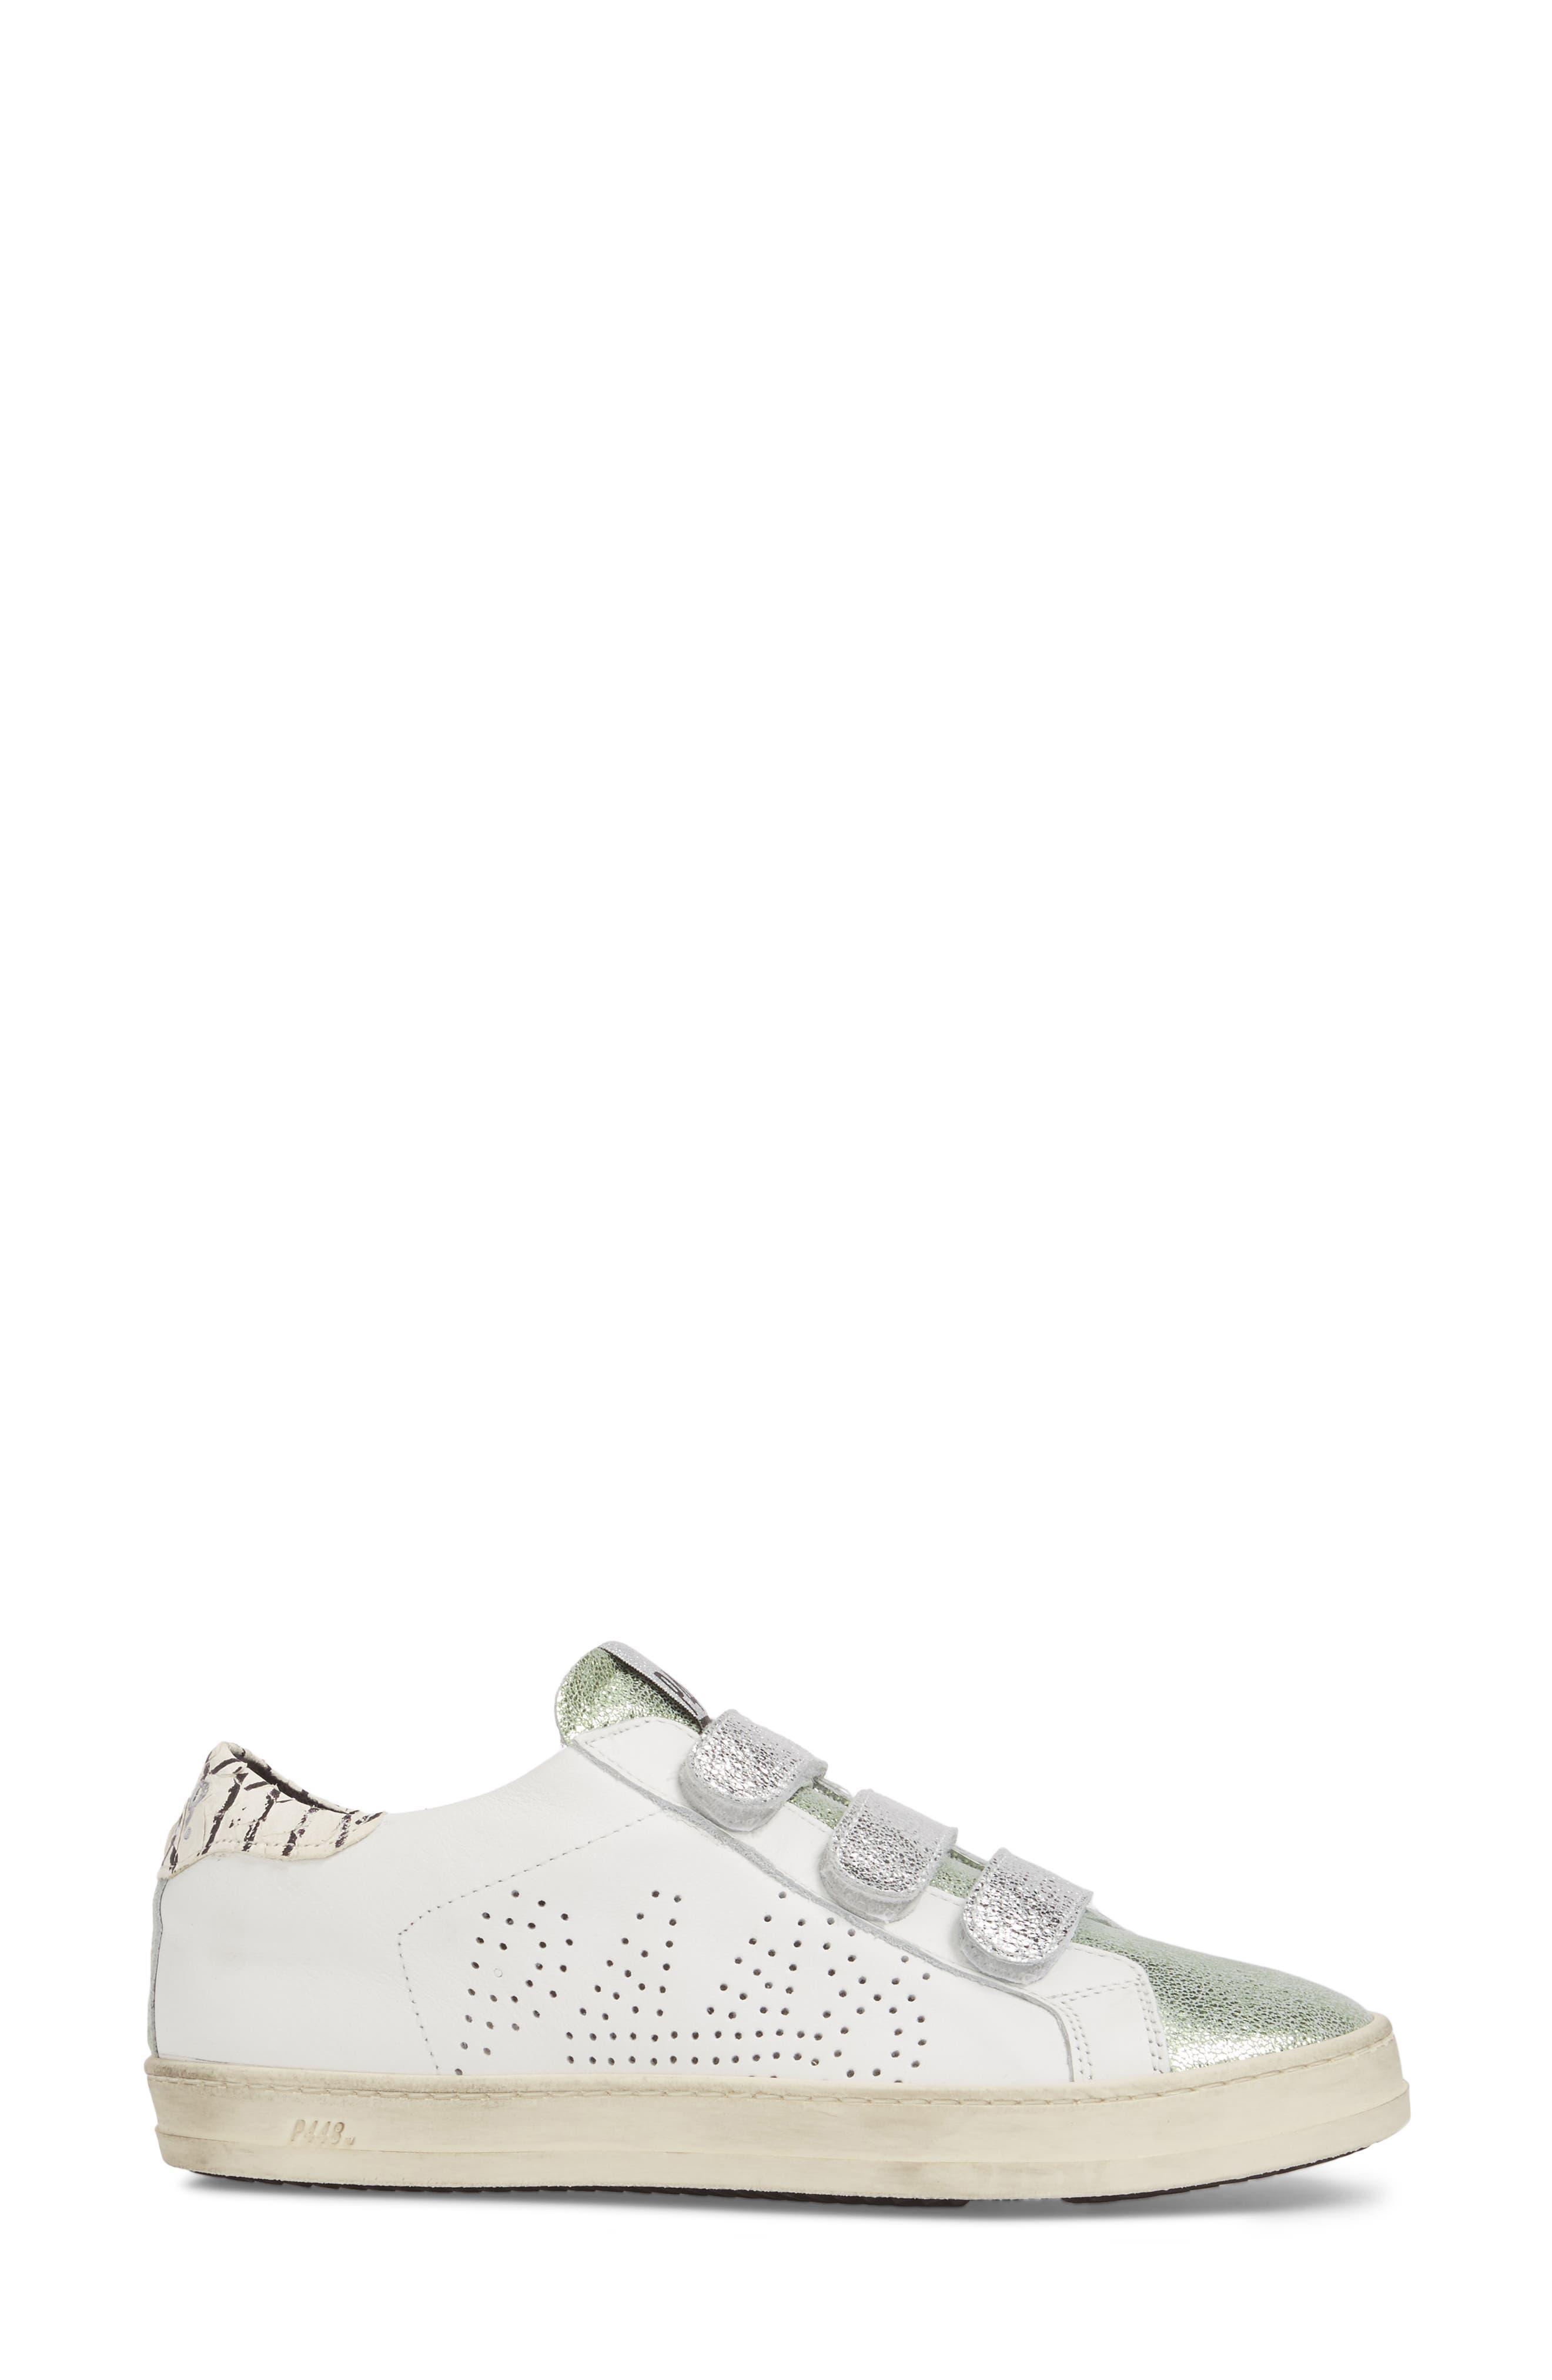 Ralph Sneaker,                             Alternate thumbnail 3, color,                             300